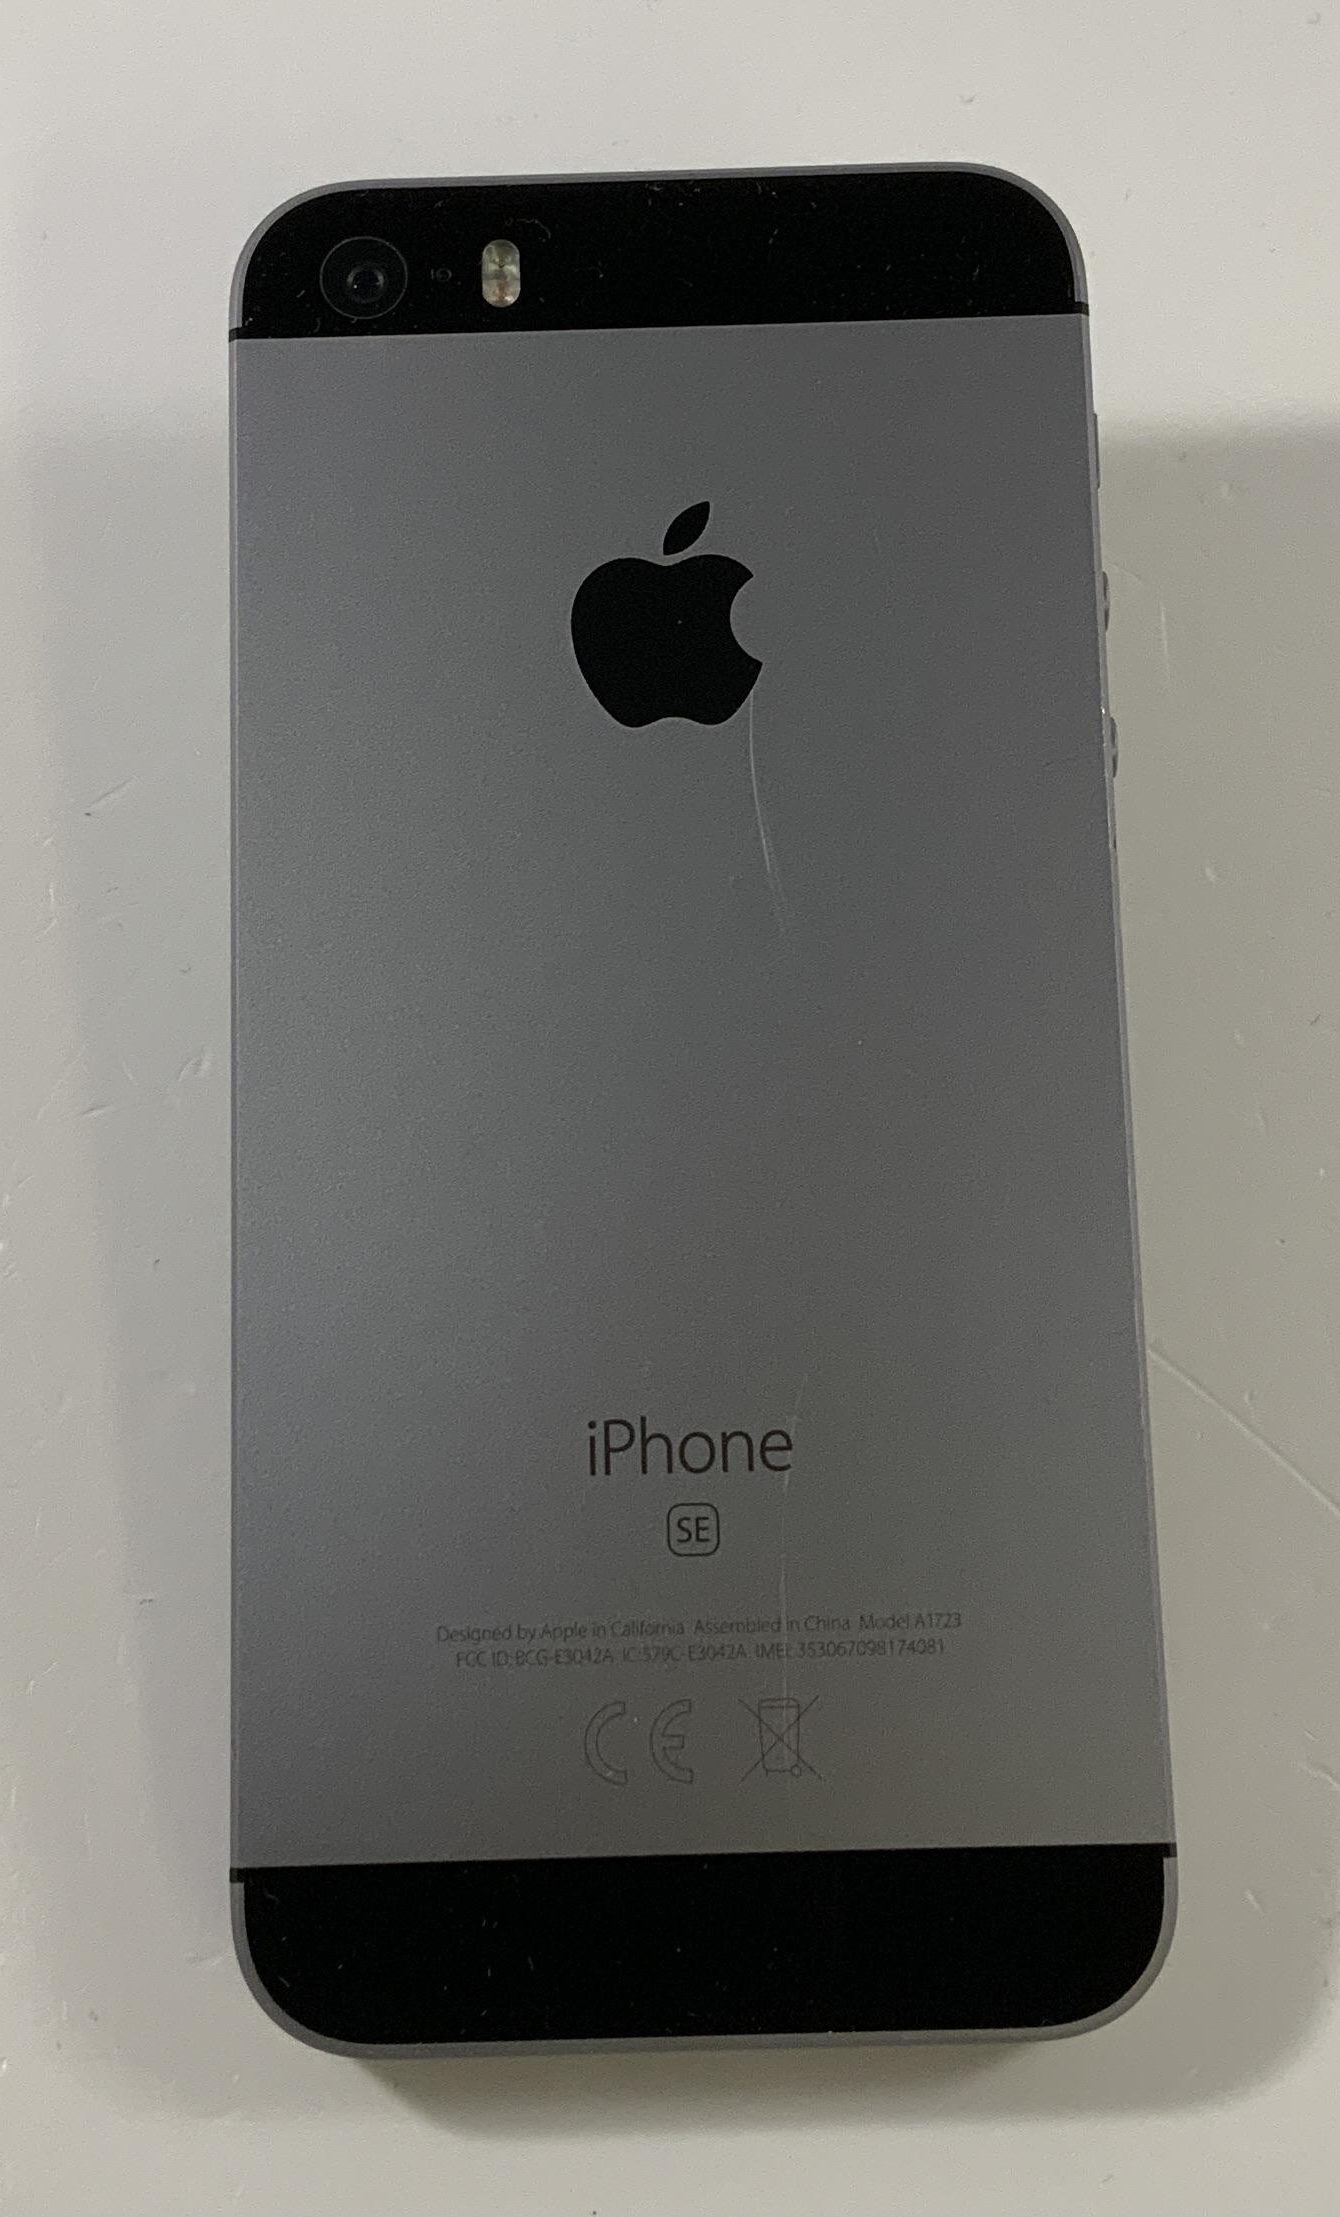 iPhone SE 32GB, 32GB, Space Gray, immagine 2